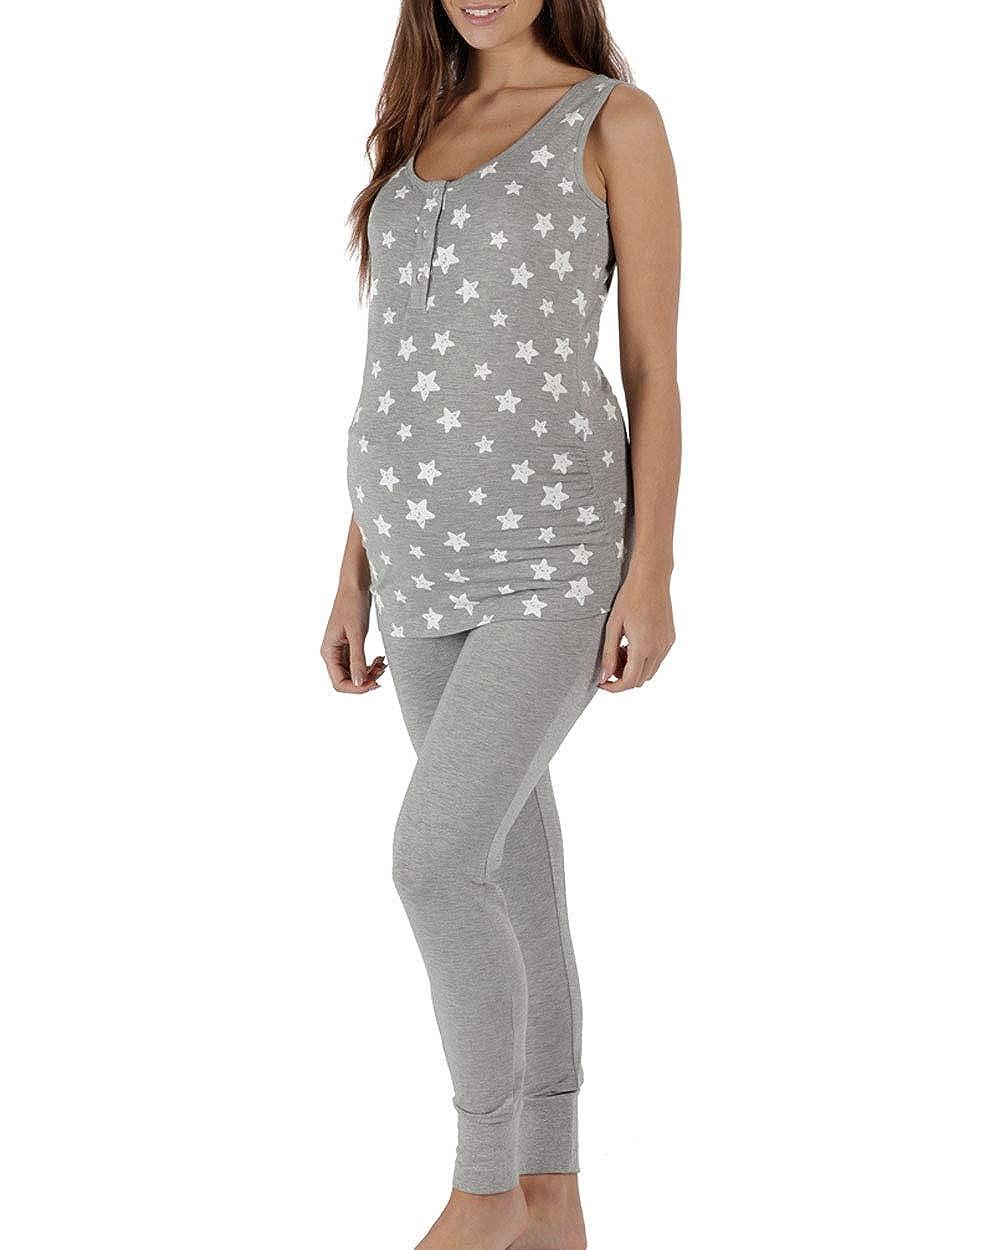 The Essential One - Womens Maternity/Nursing Star Jogger Pyjama Set - Grey - EOM214